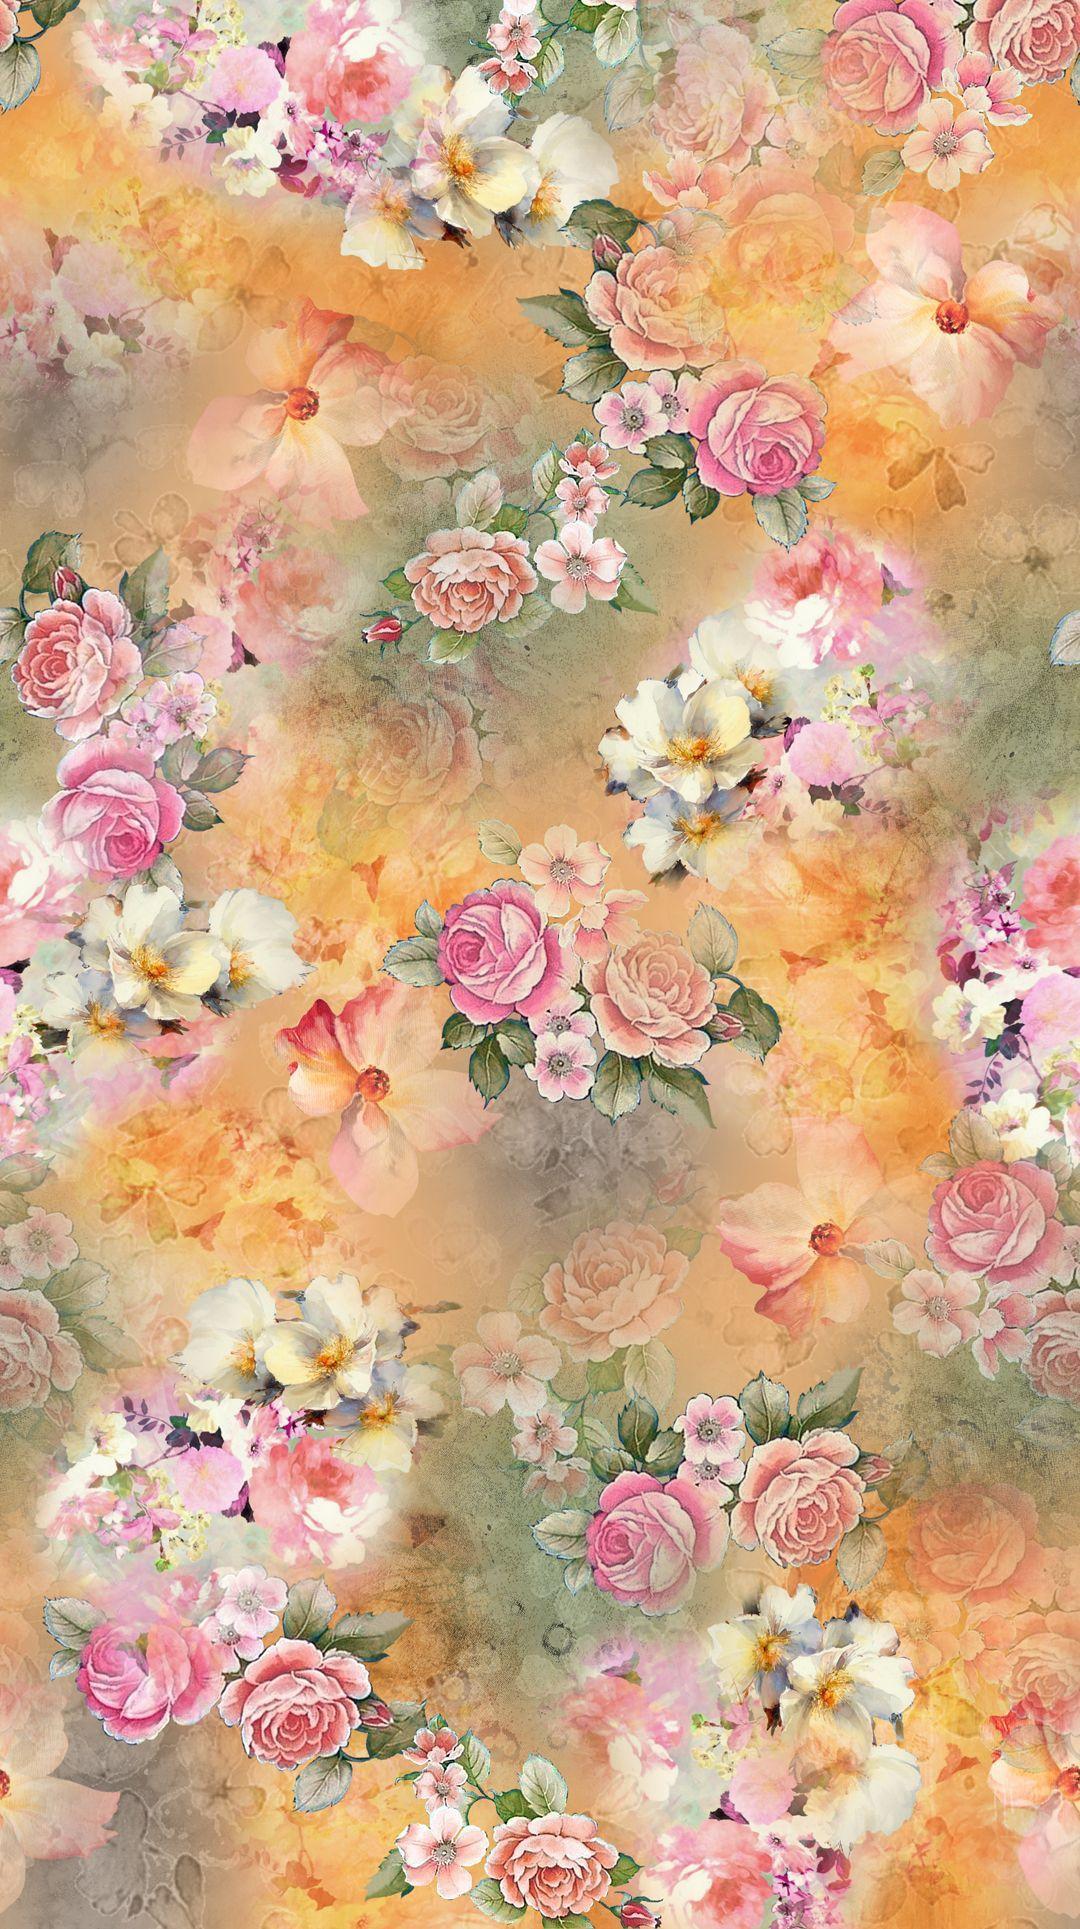 Pin by venuchilukuri on venu vintage flowers wallpaper